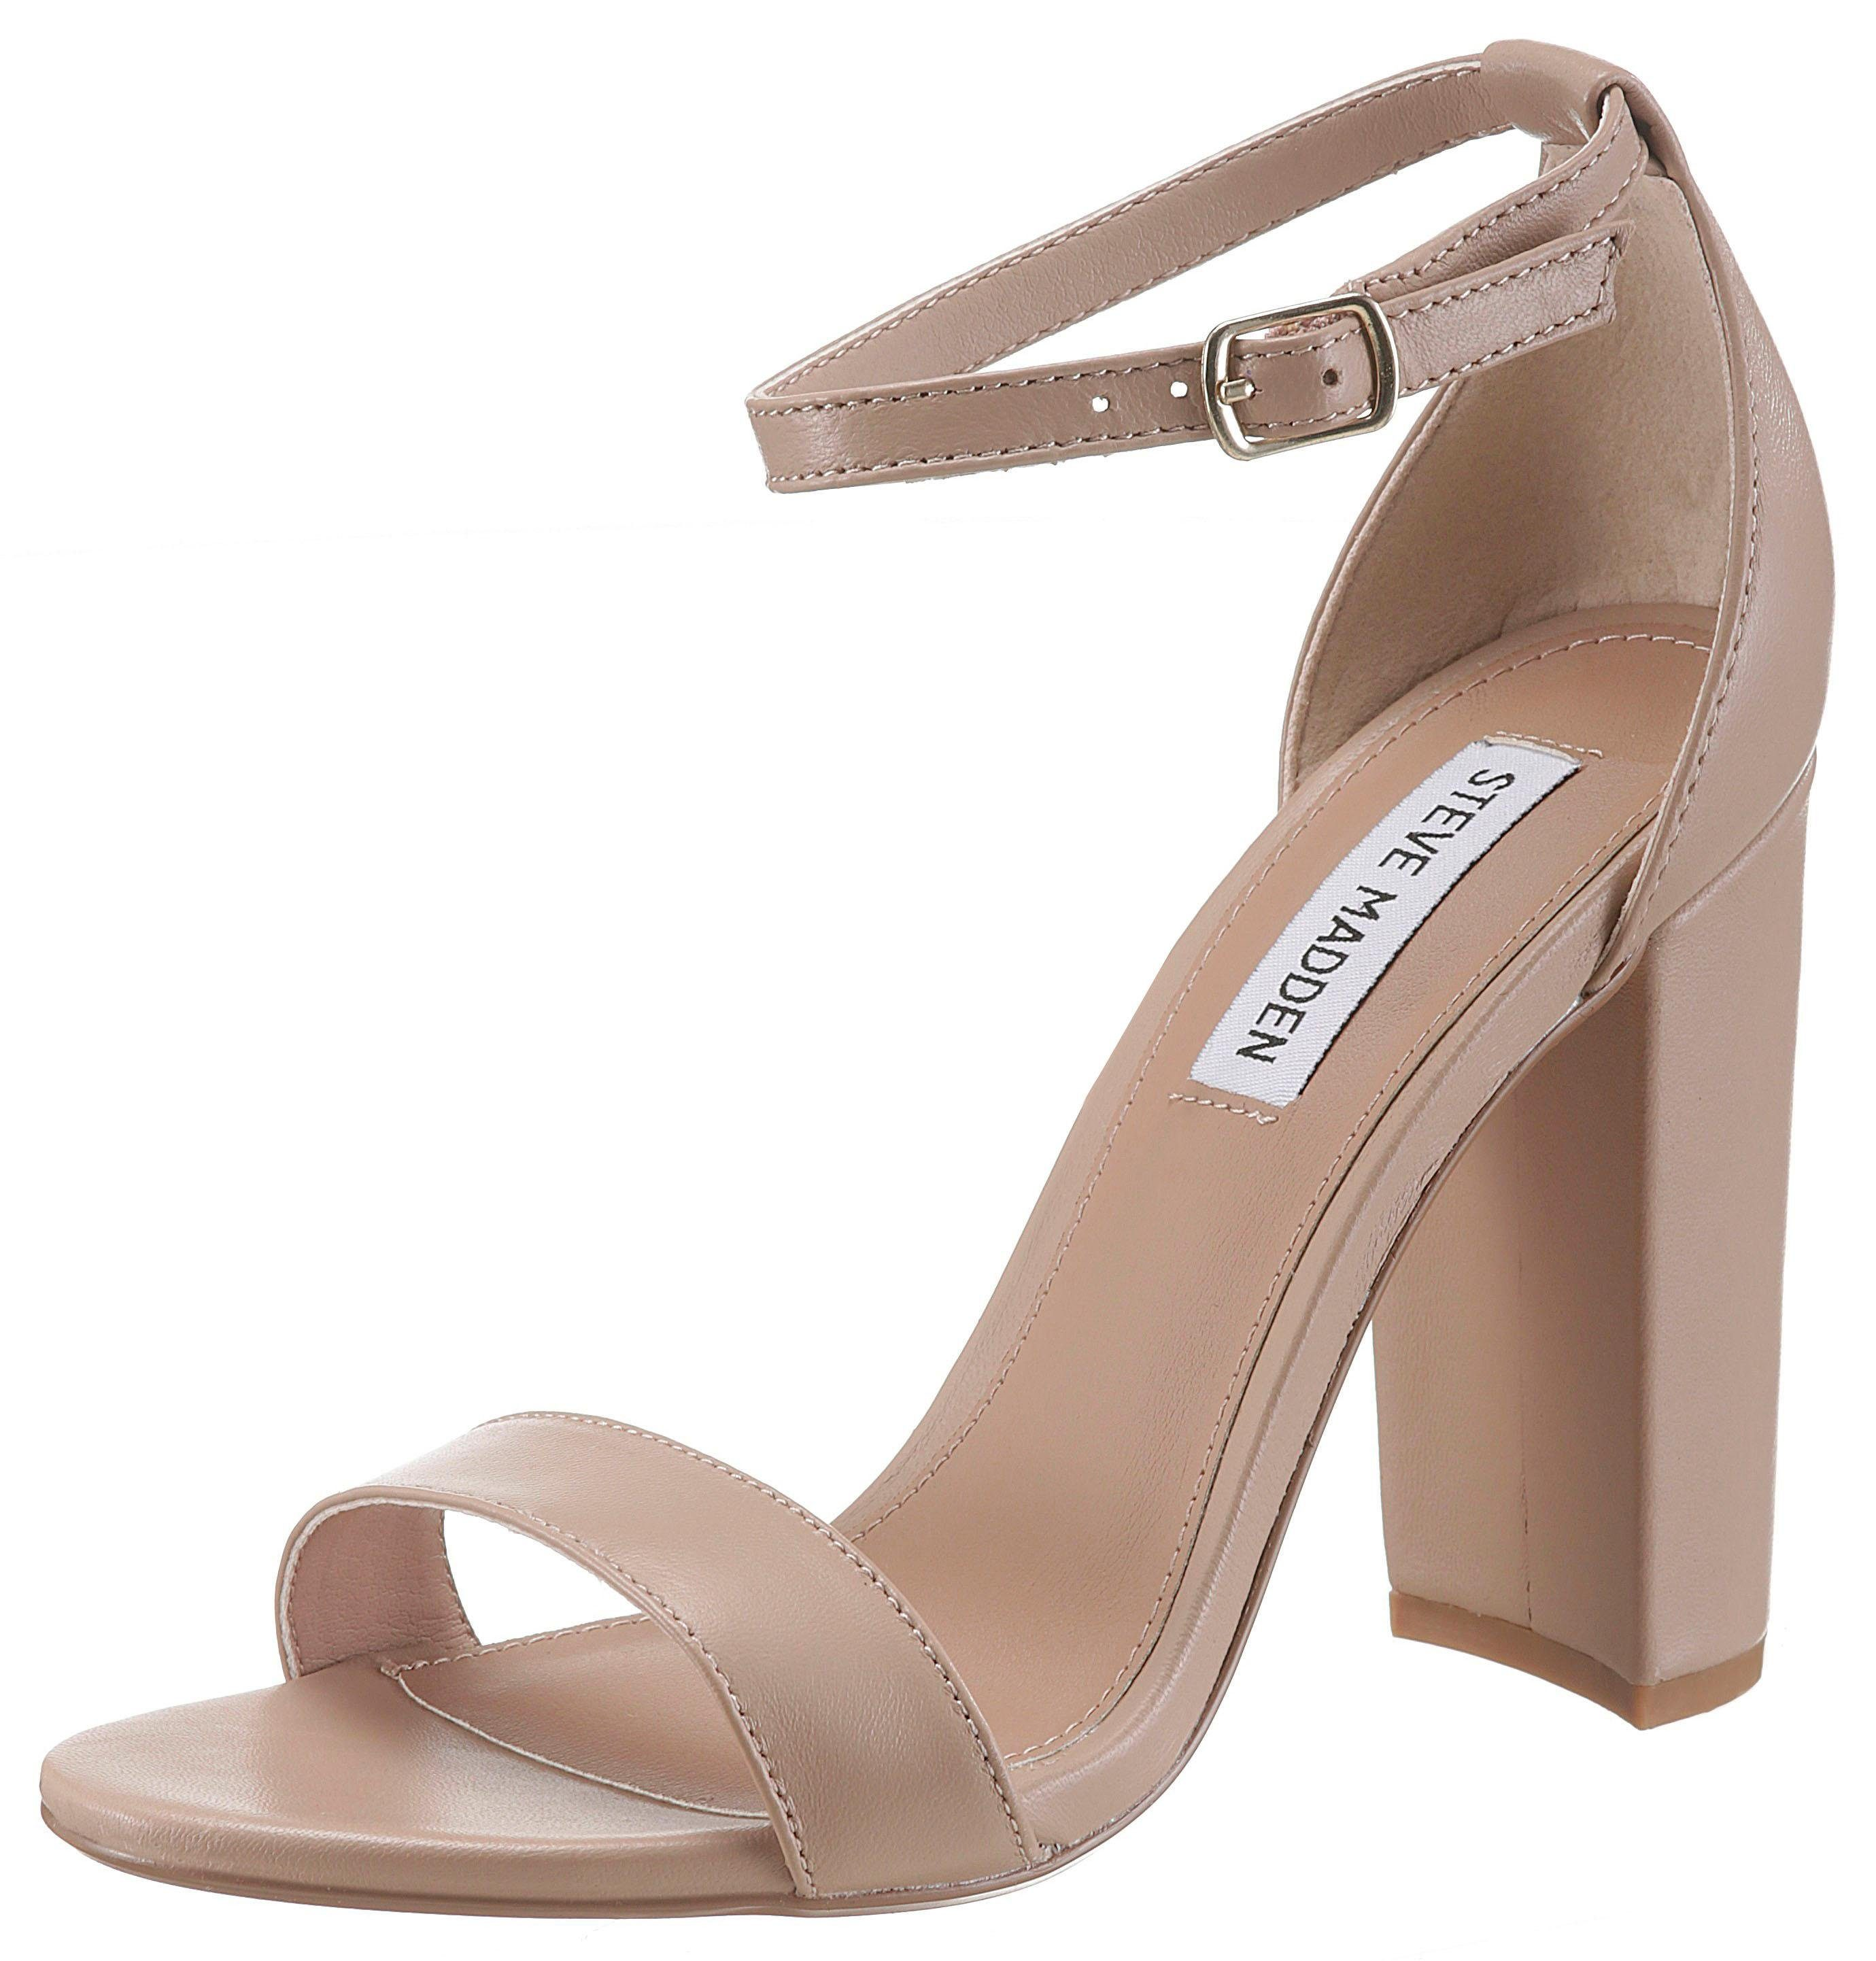 STEVE MADDEN Sandalette, kaufen im eleganten Look kaufen Sandalette,  nude cfe620